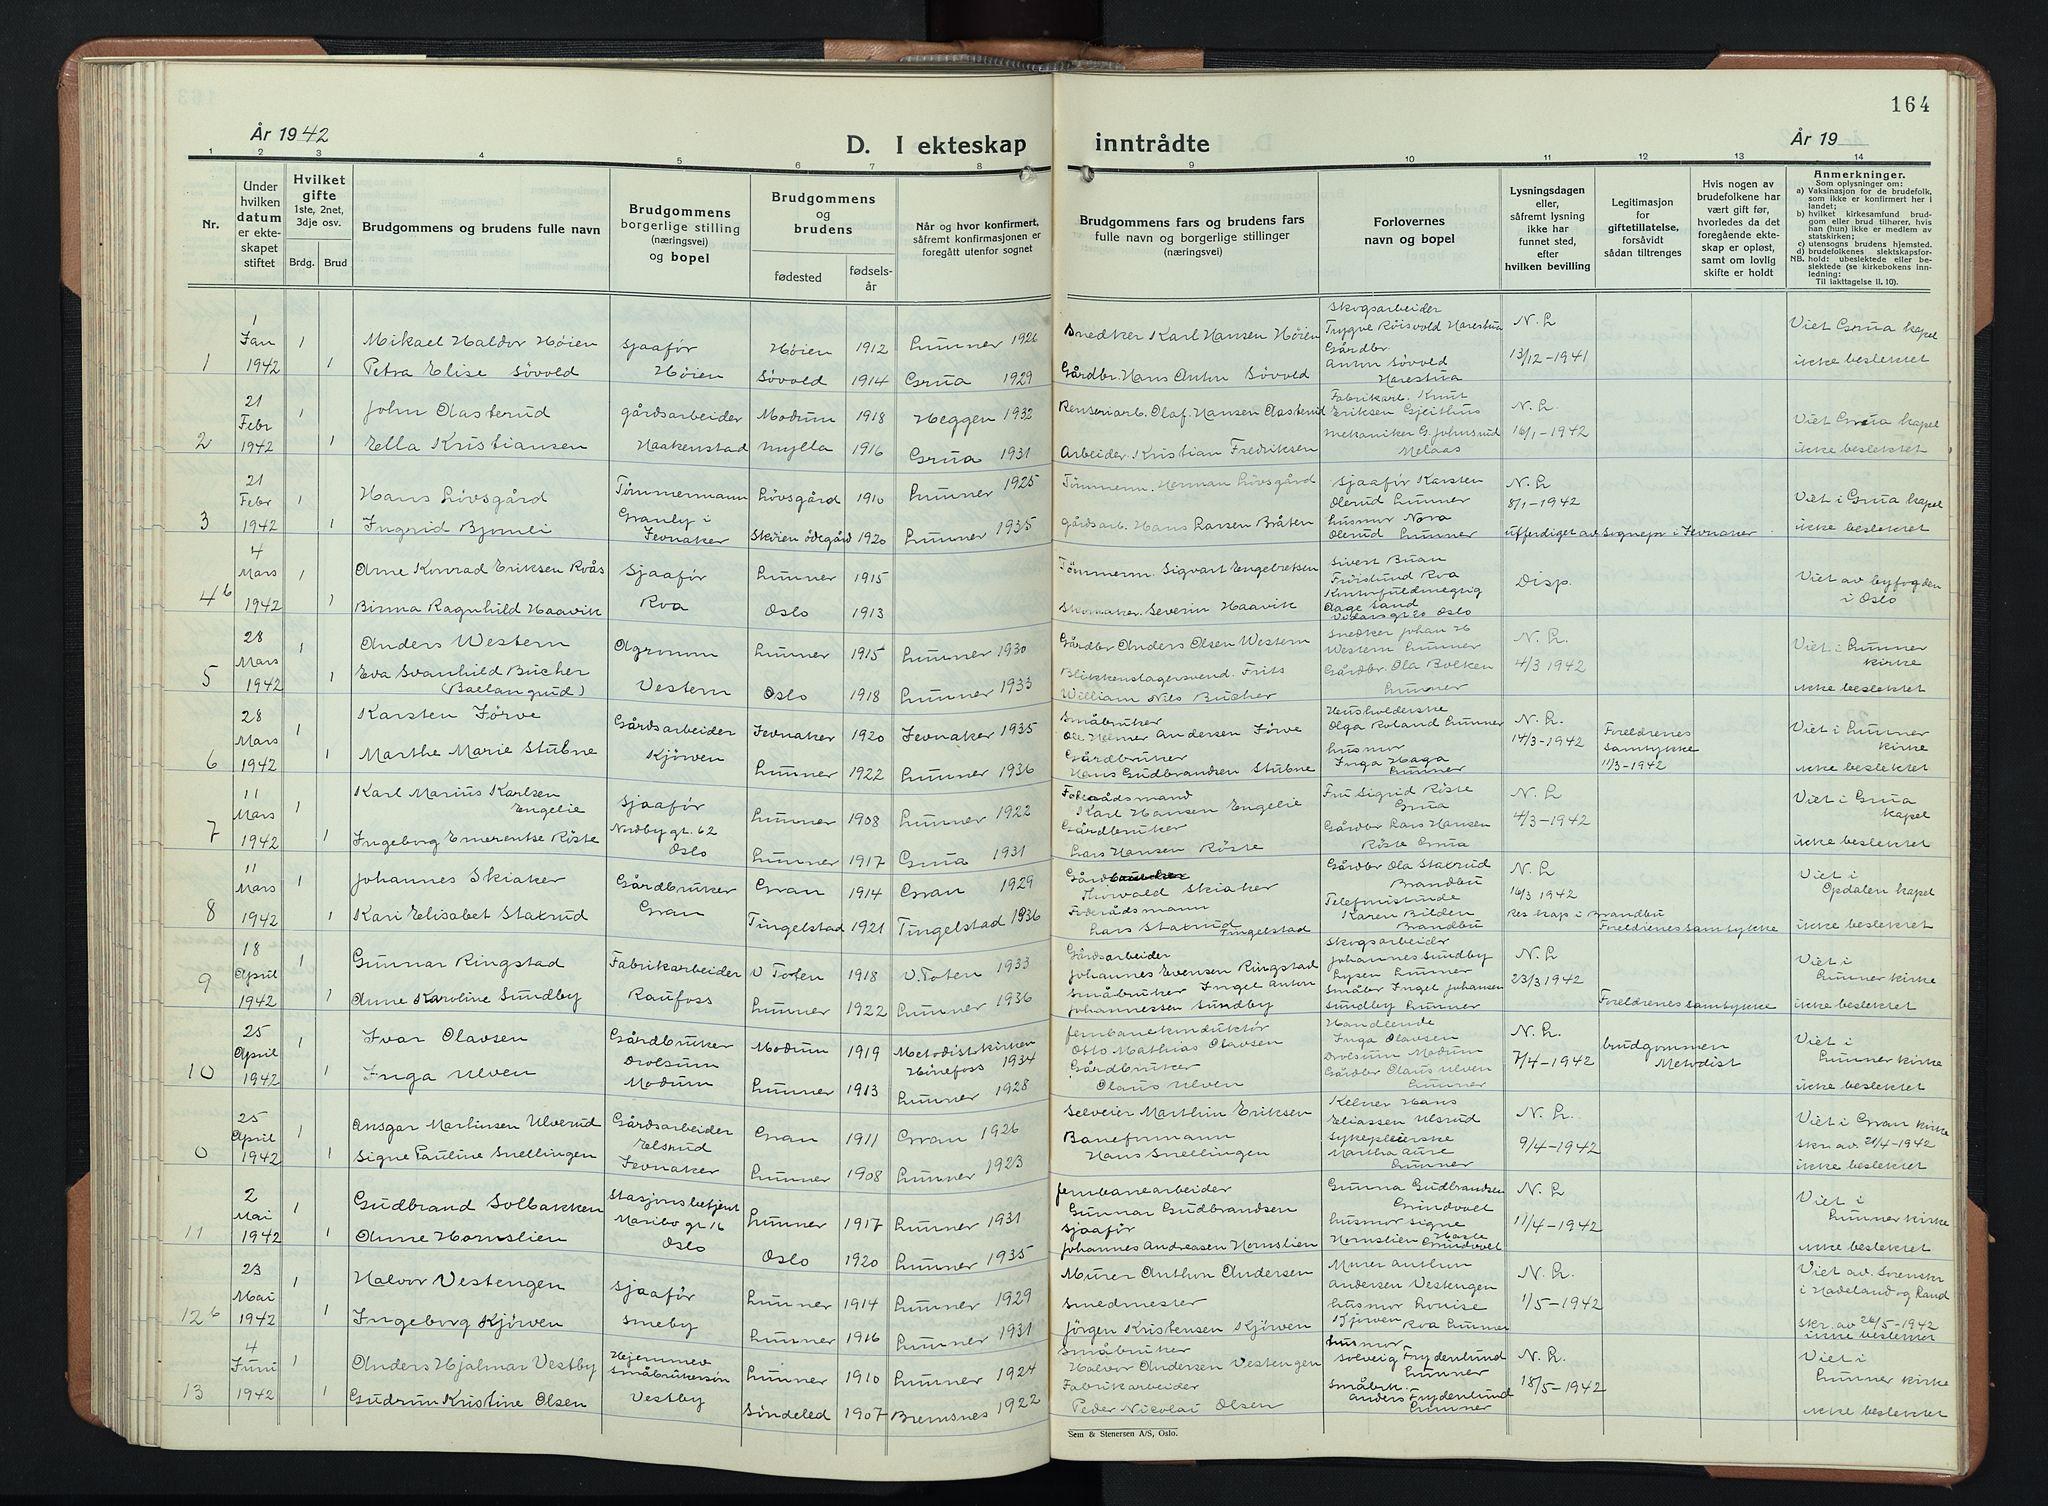 SAH, Lunner prestekontor, H/Ha/Hab/L0003: Klokkerbok nr. 3, 1933-1945, s. 164